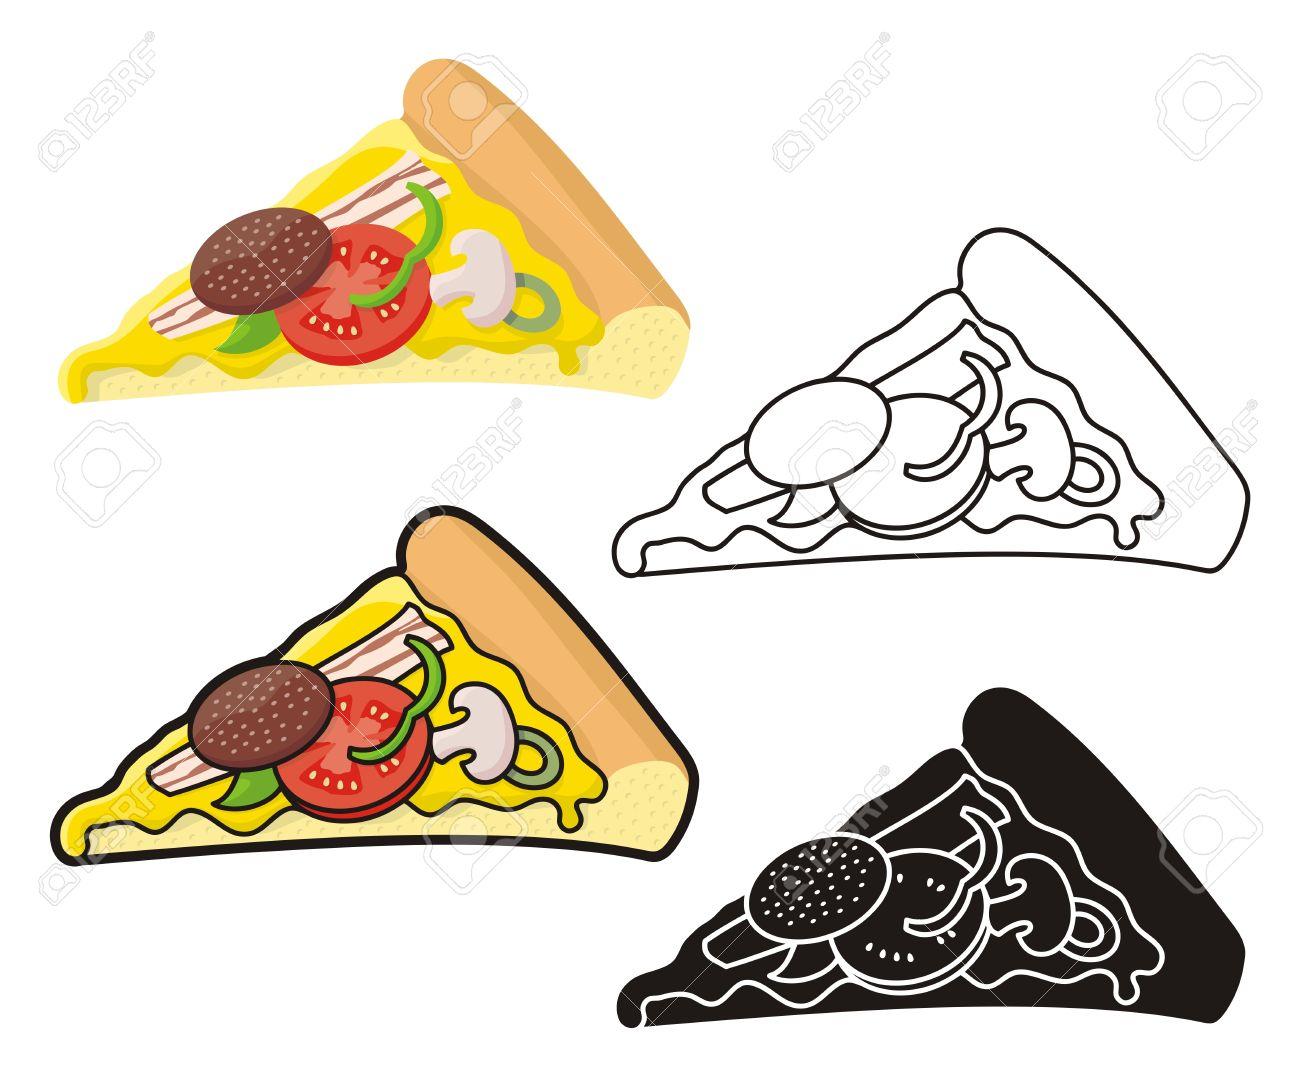 Pizza slice illustration in four versions. - 15697412